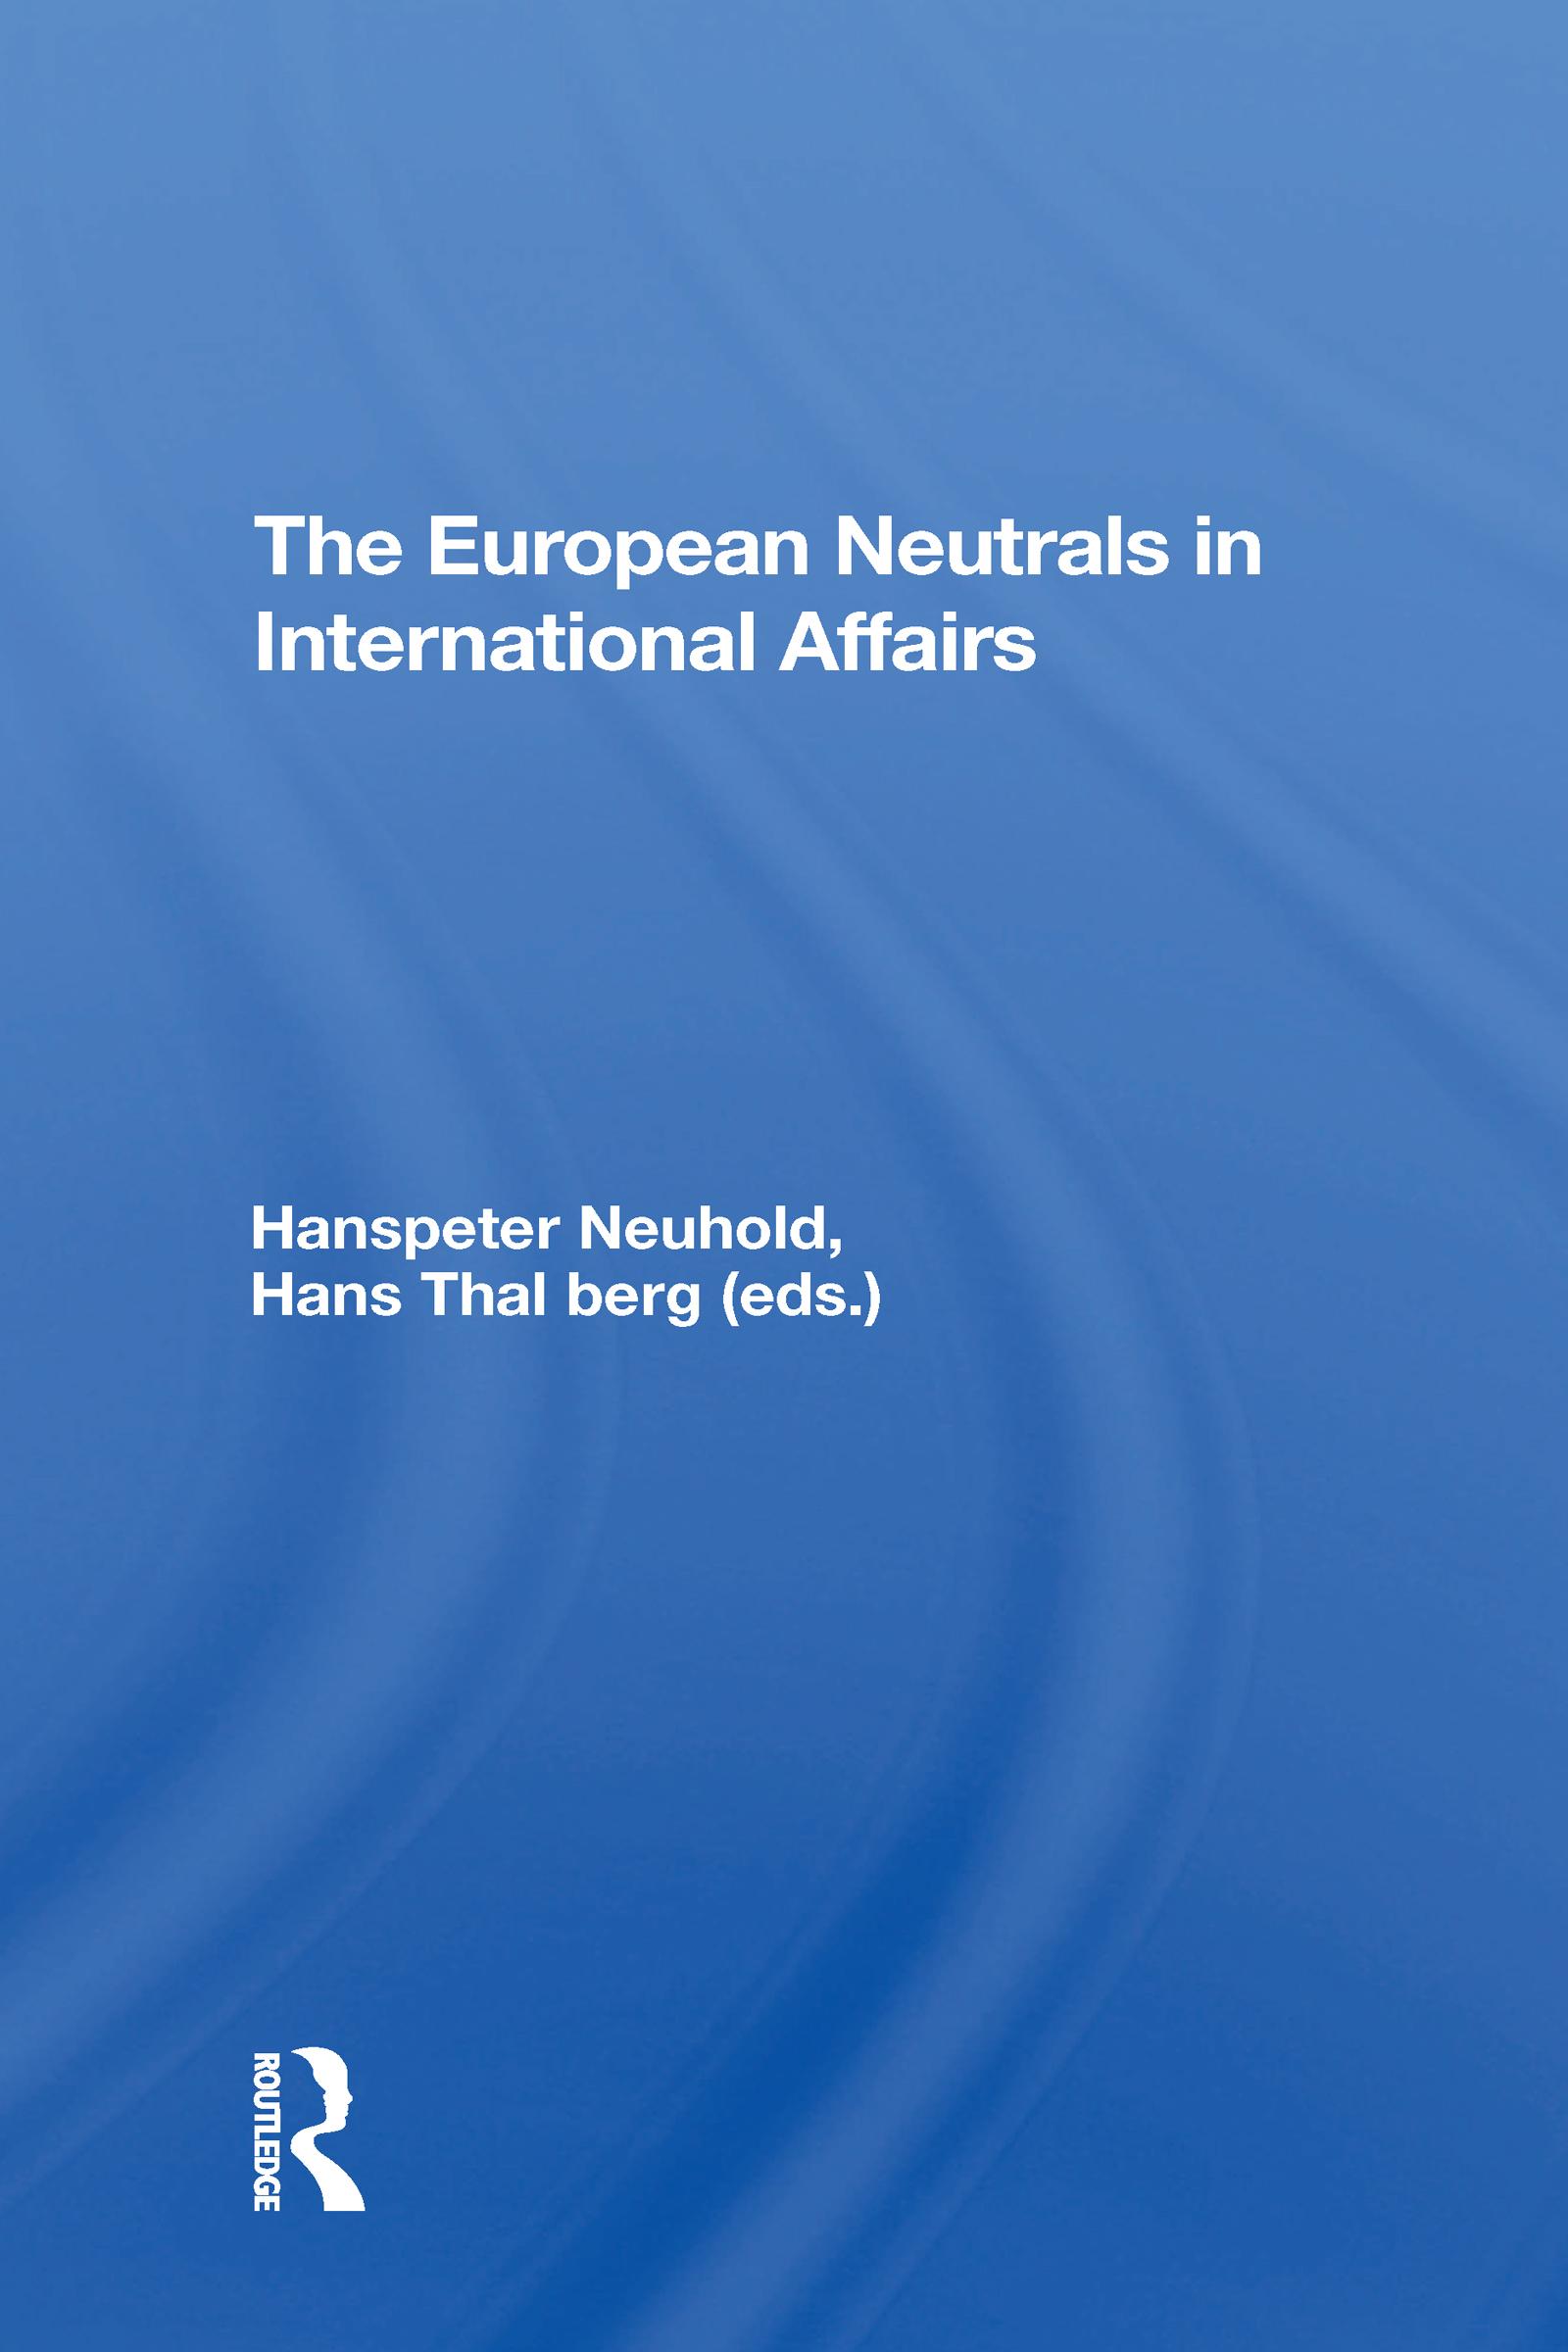 The European Neutrals in International Affairs